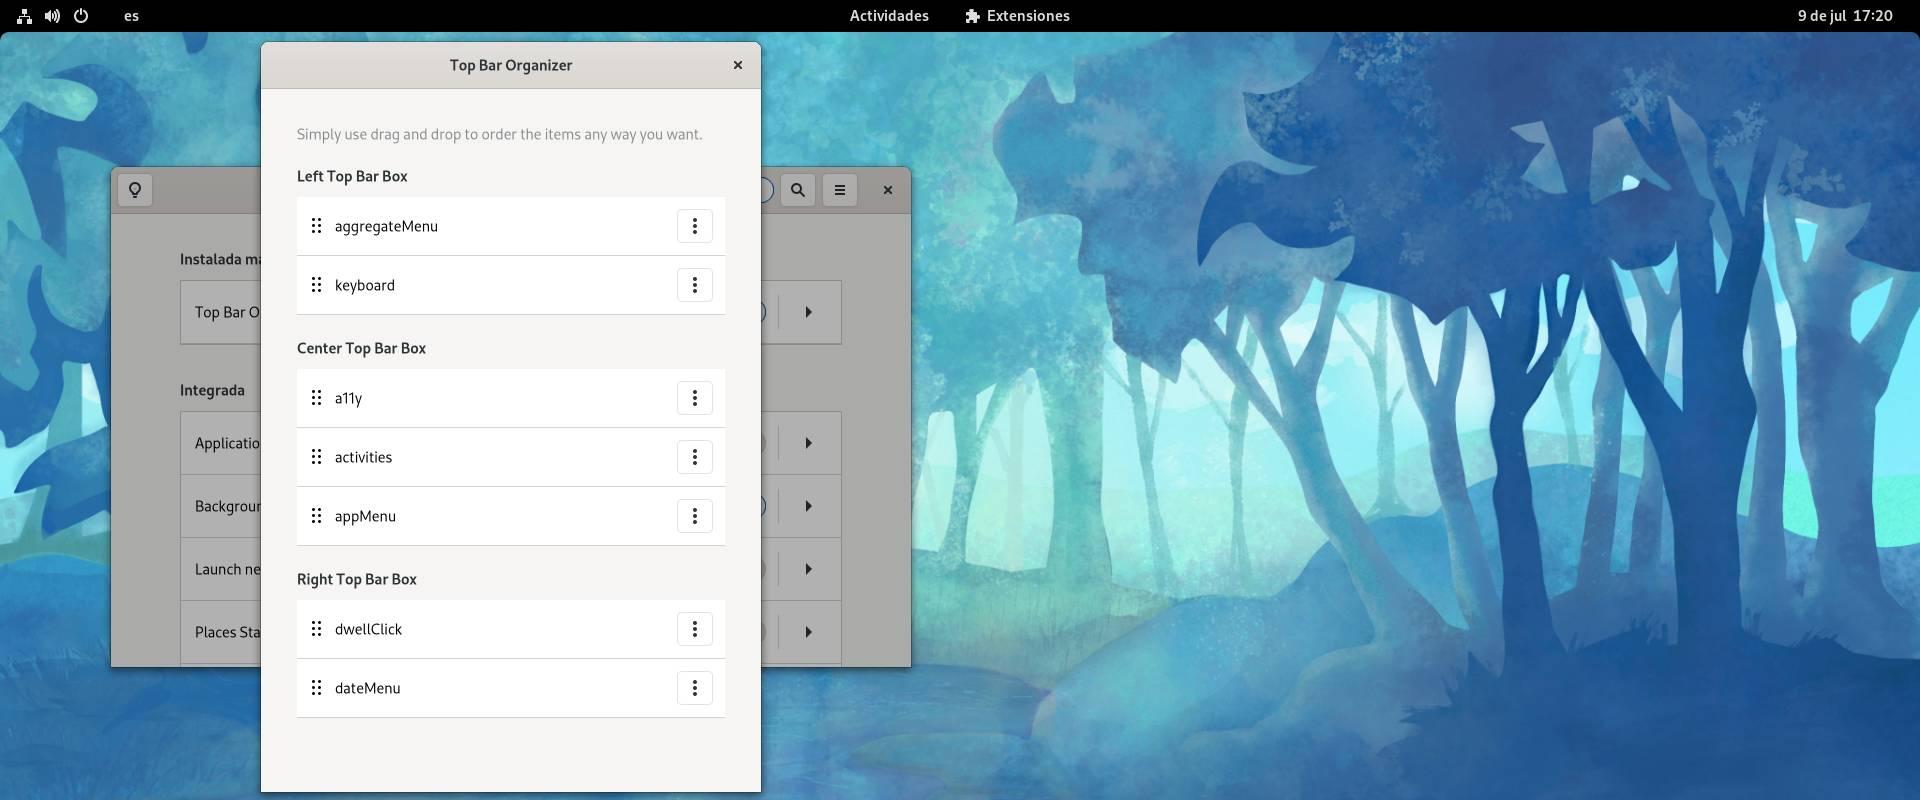 Top Bar Organizer en Fedora 34 Workstation (GNOME 40)